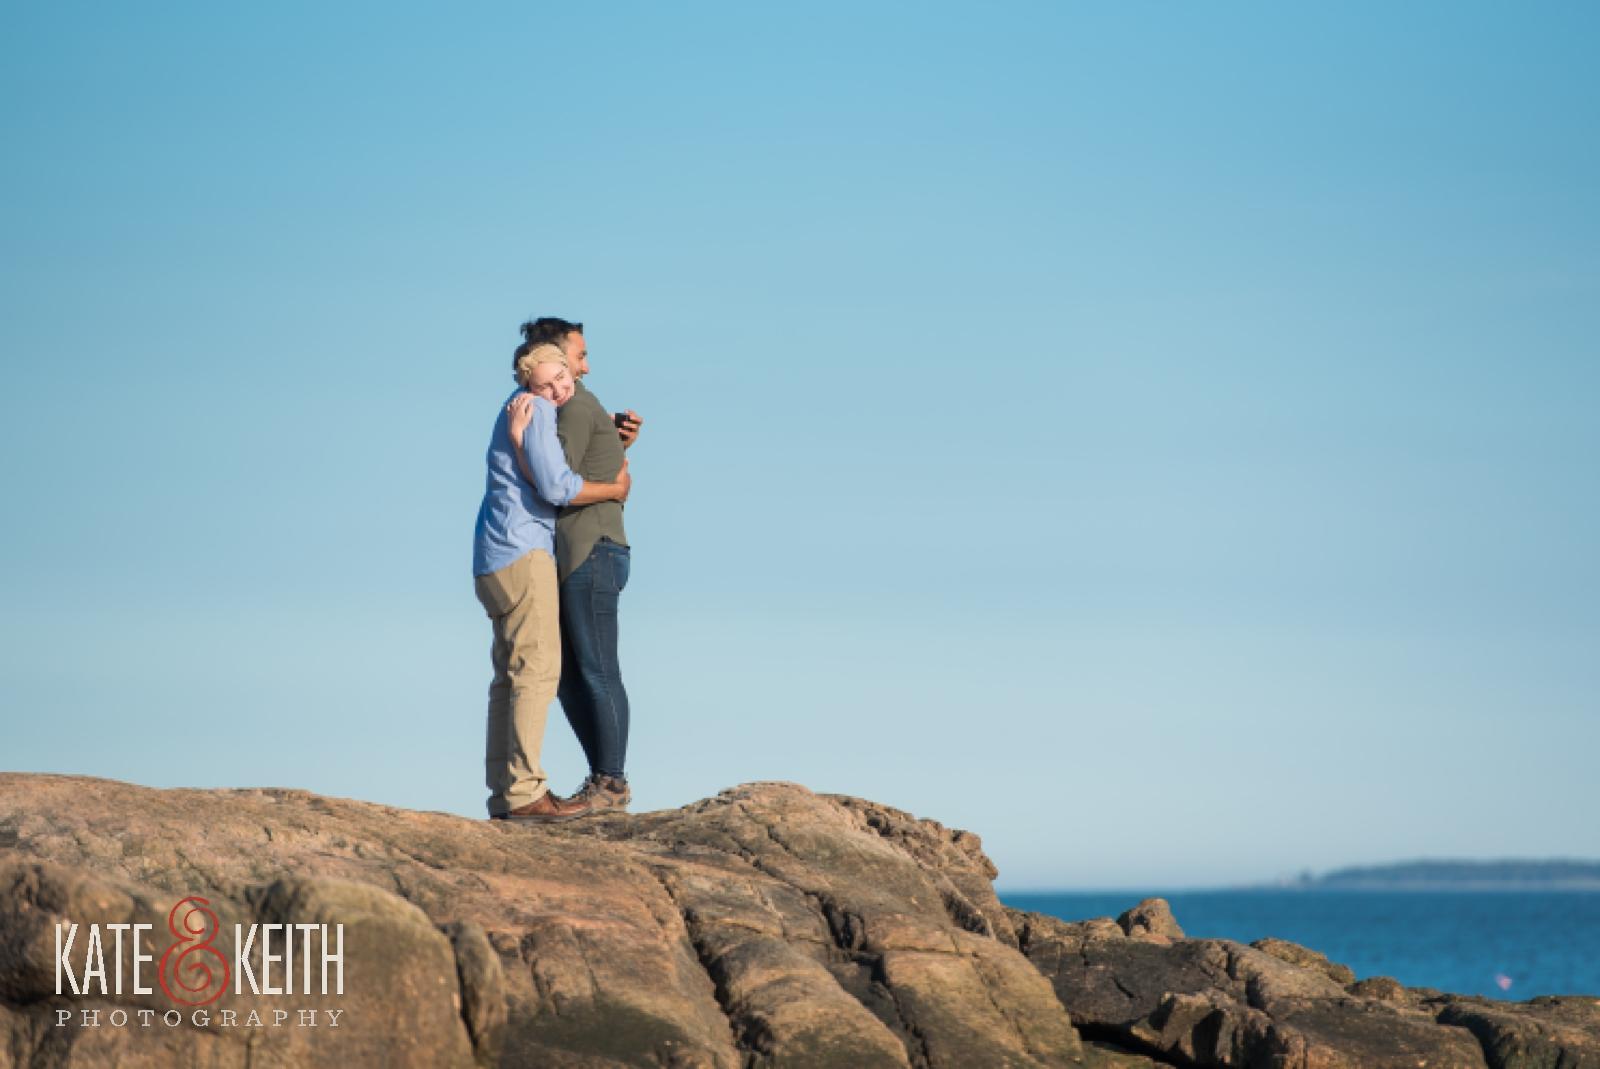 Couple celebrating engagement in Acadia National Park, Maine, Mount Desert Island, surprise proposal, wedding proposal, coast, ocean, seaside